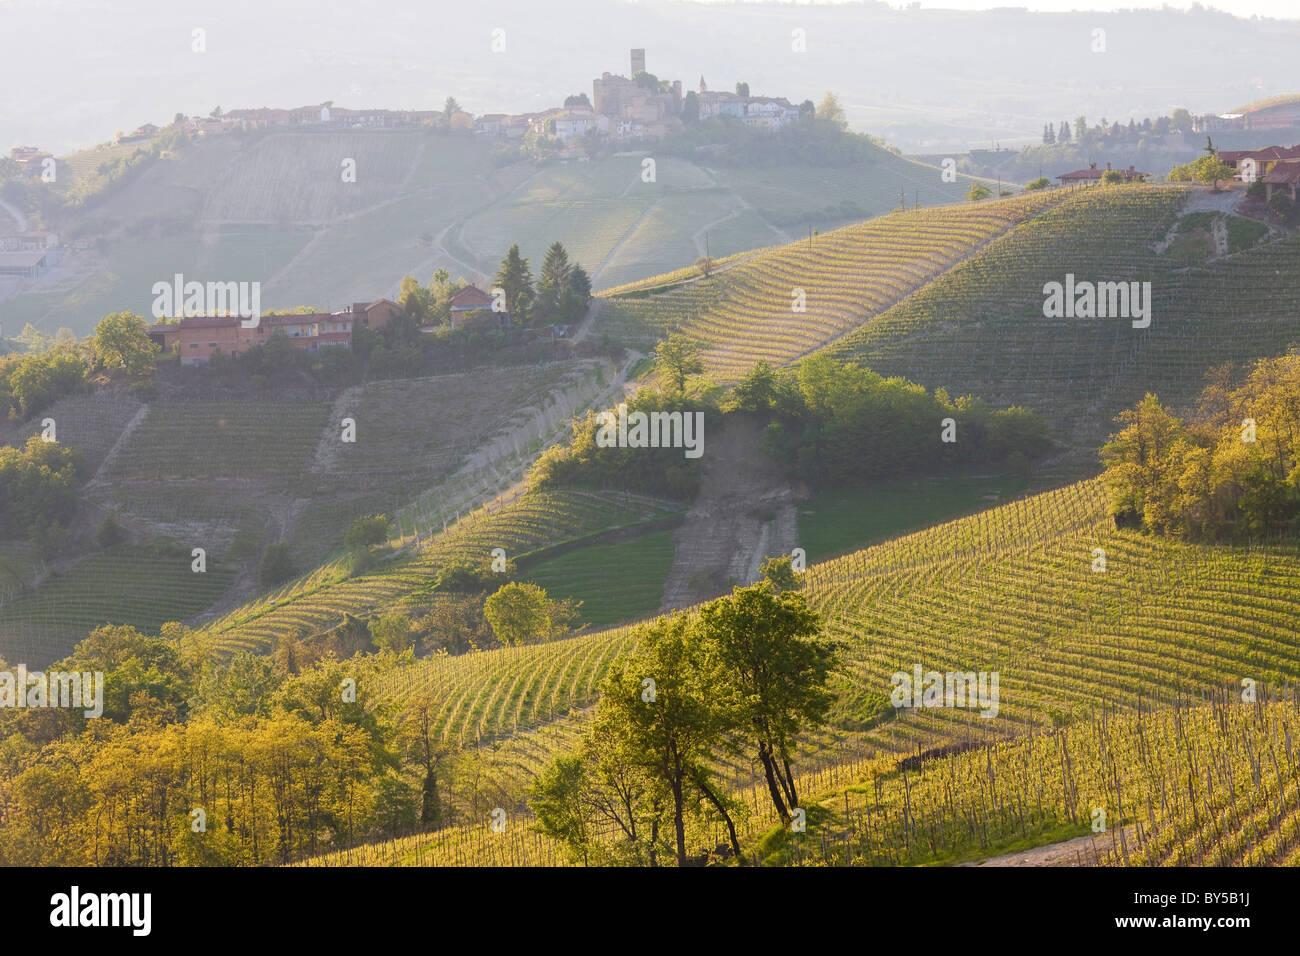 View to Serralunga d' Alba, Piedmont (or Piemonte or Piedmonte), Italy - Stock Image